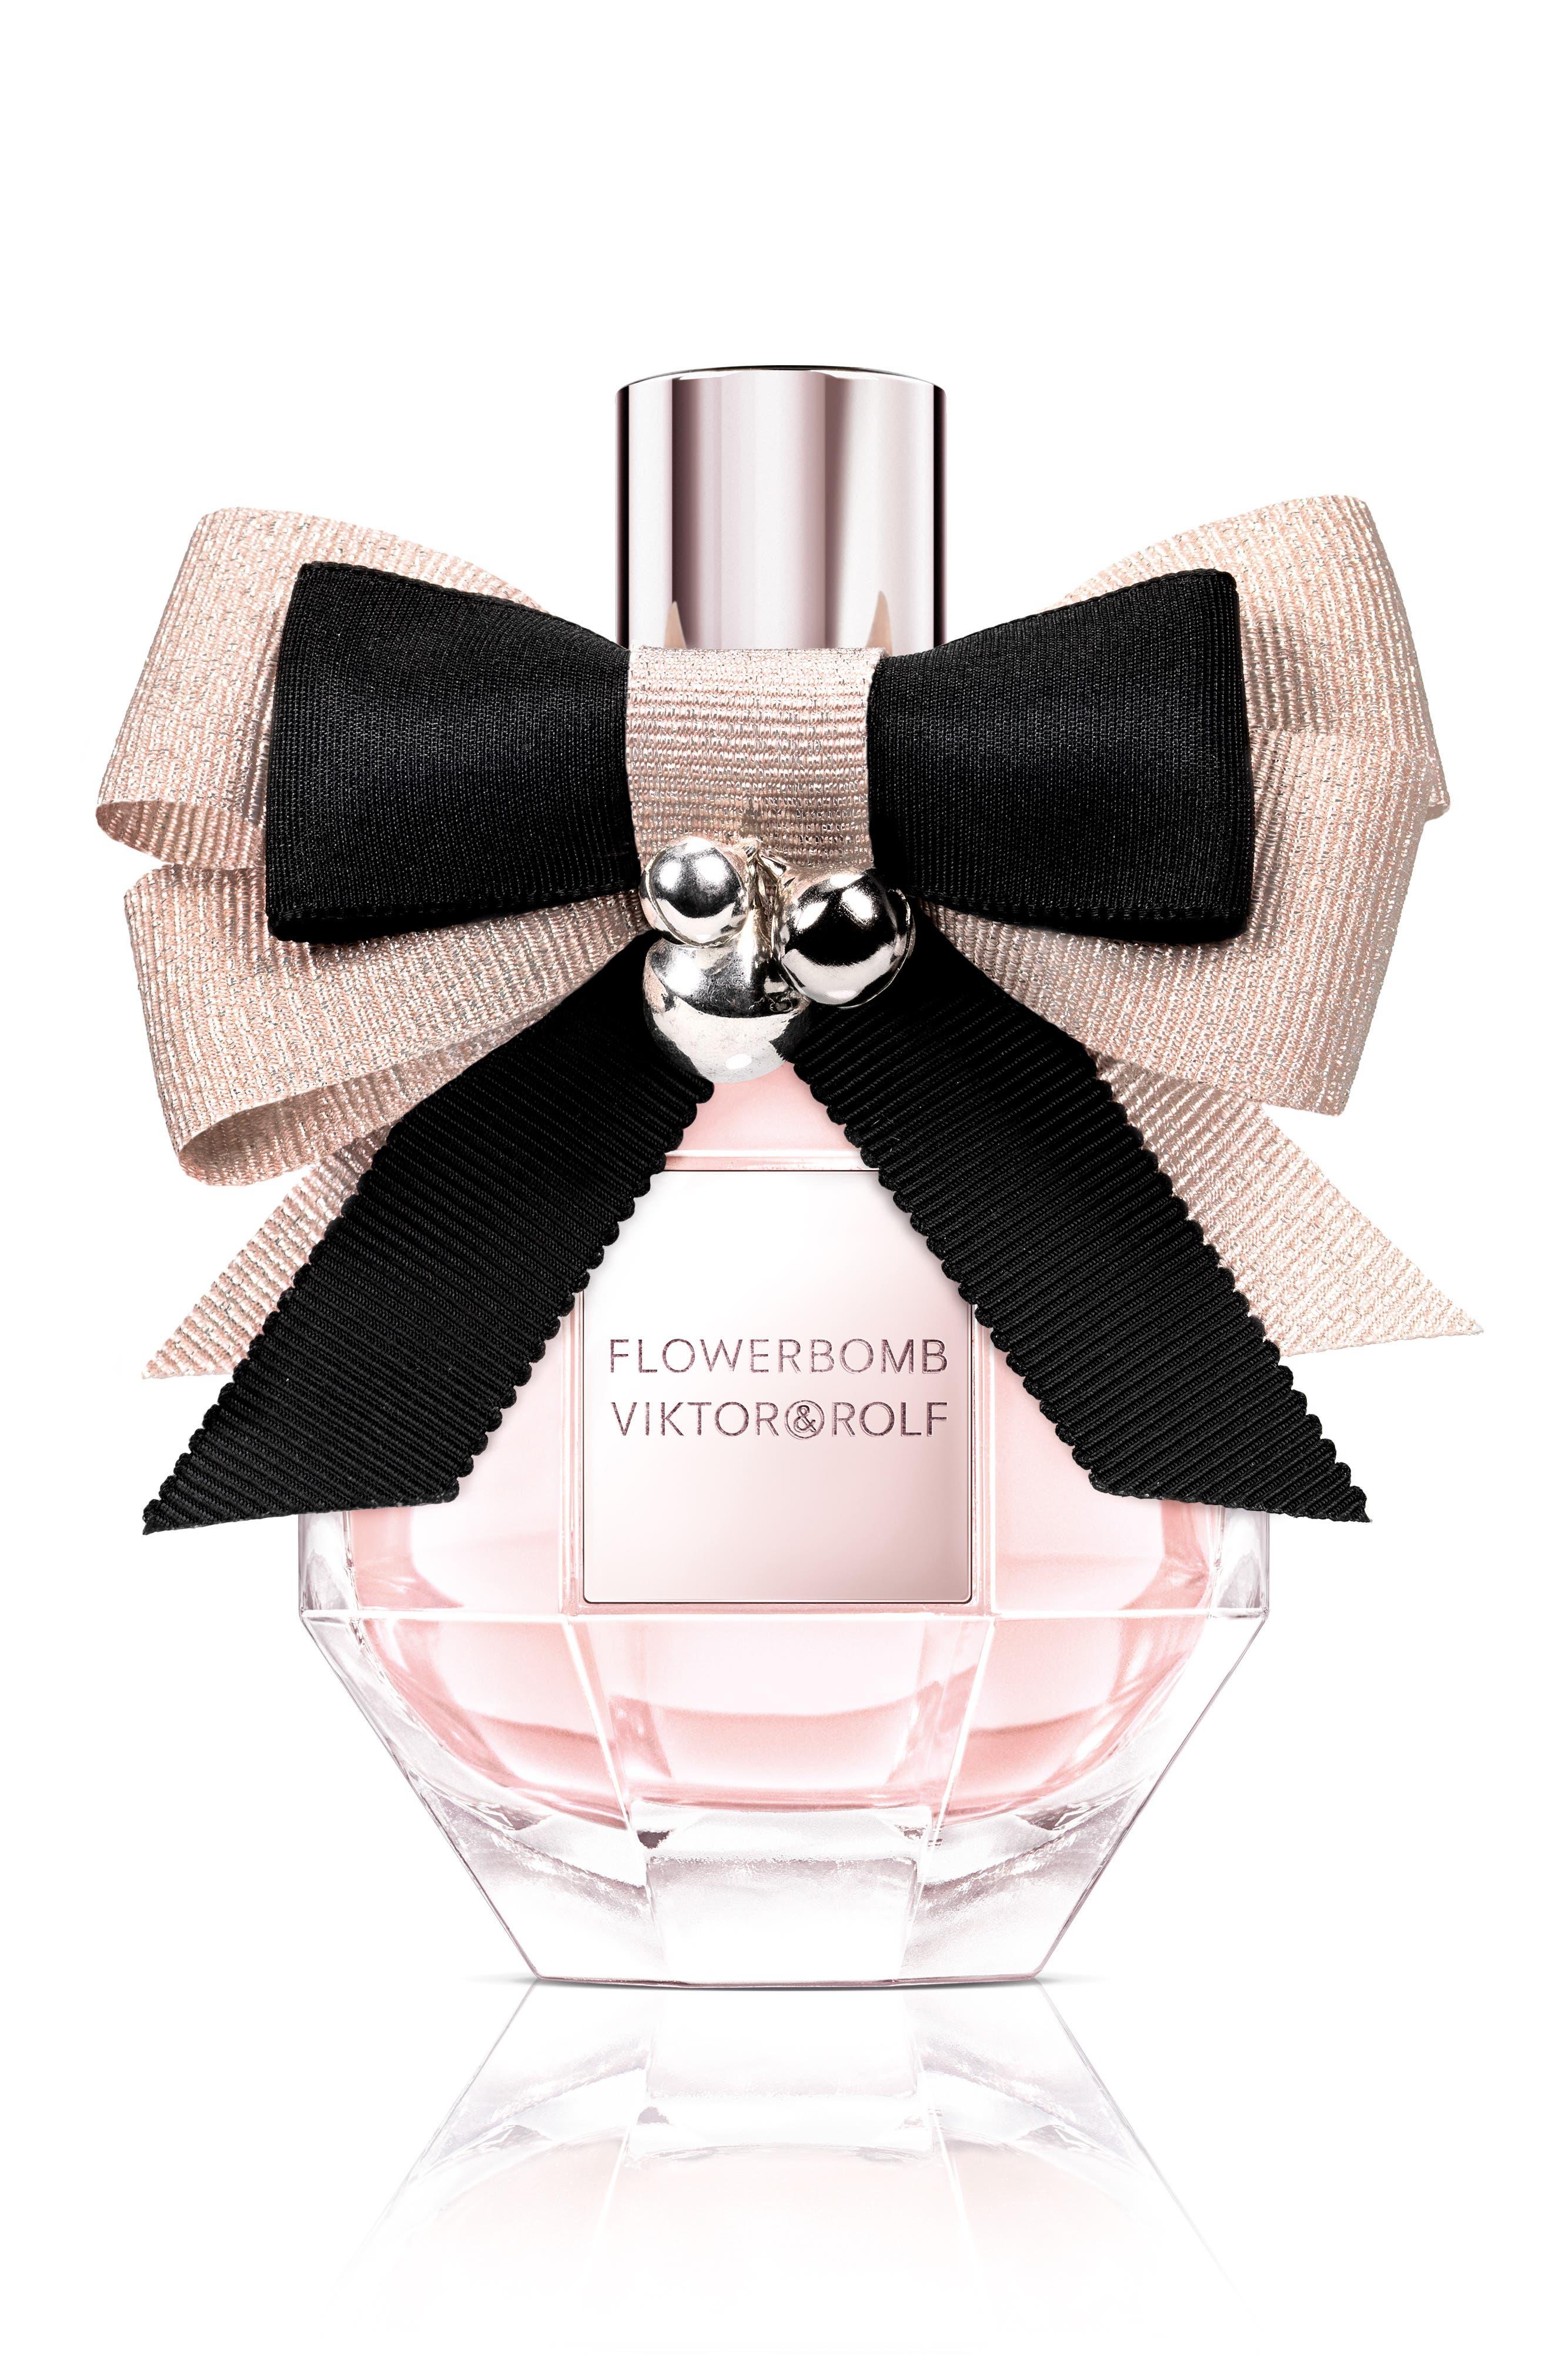 3803d6acbac0 Viktor Rolf Flowerbomb Perfume